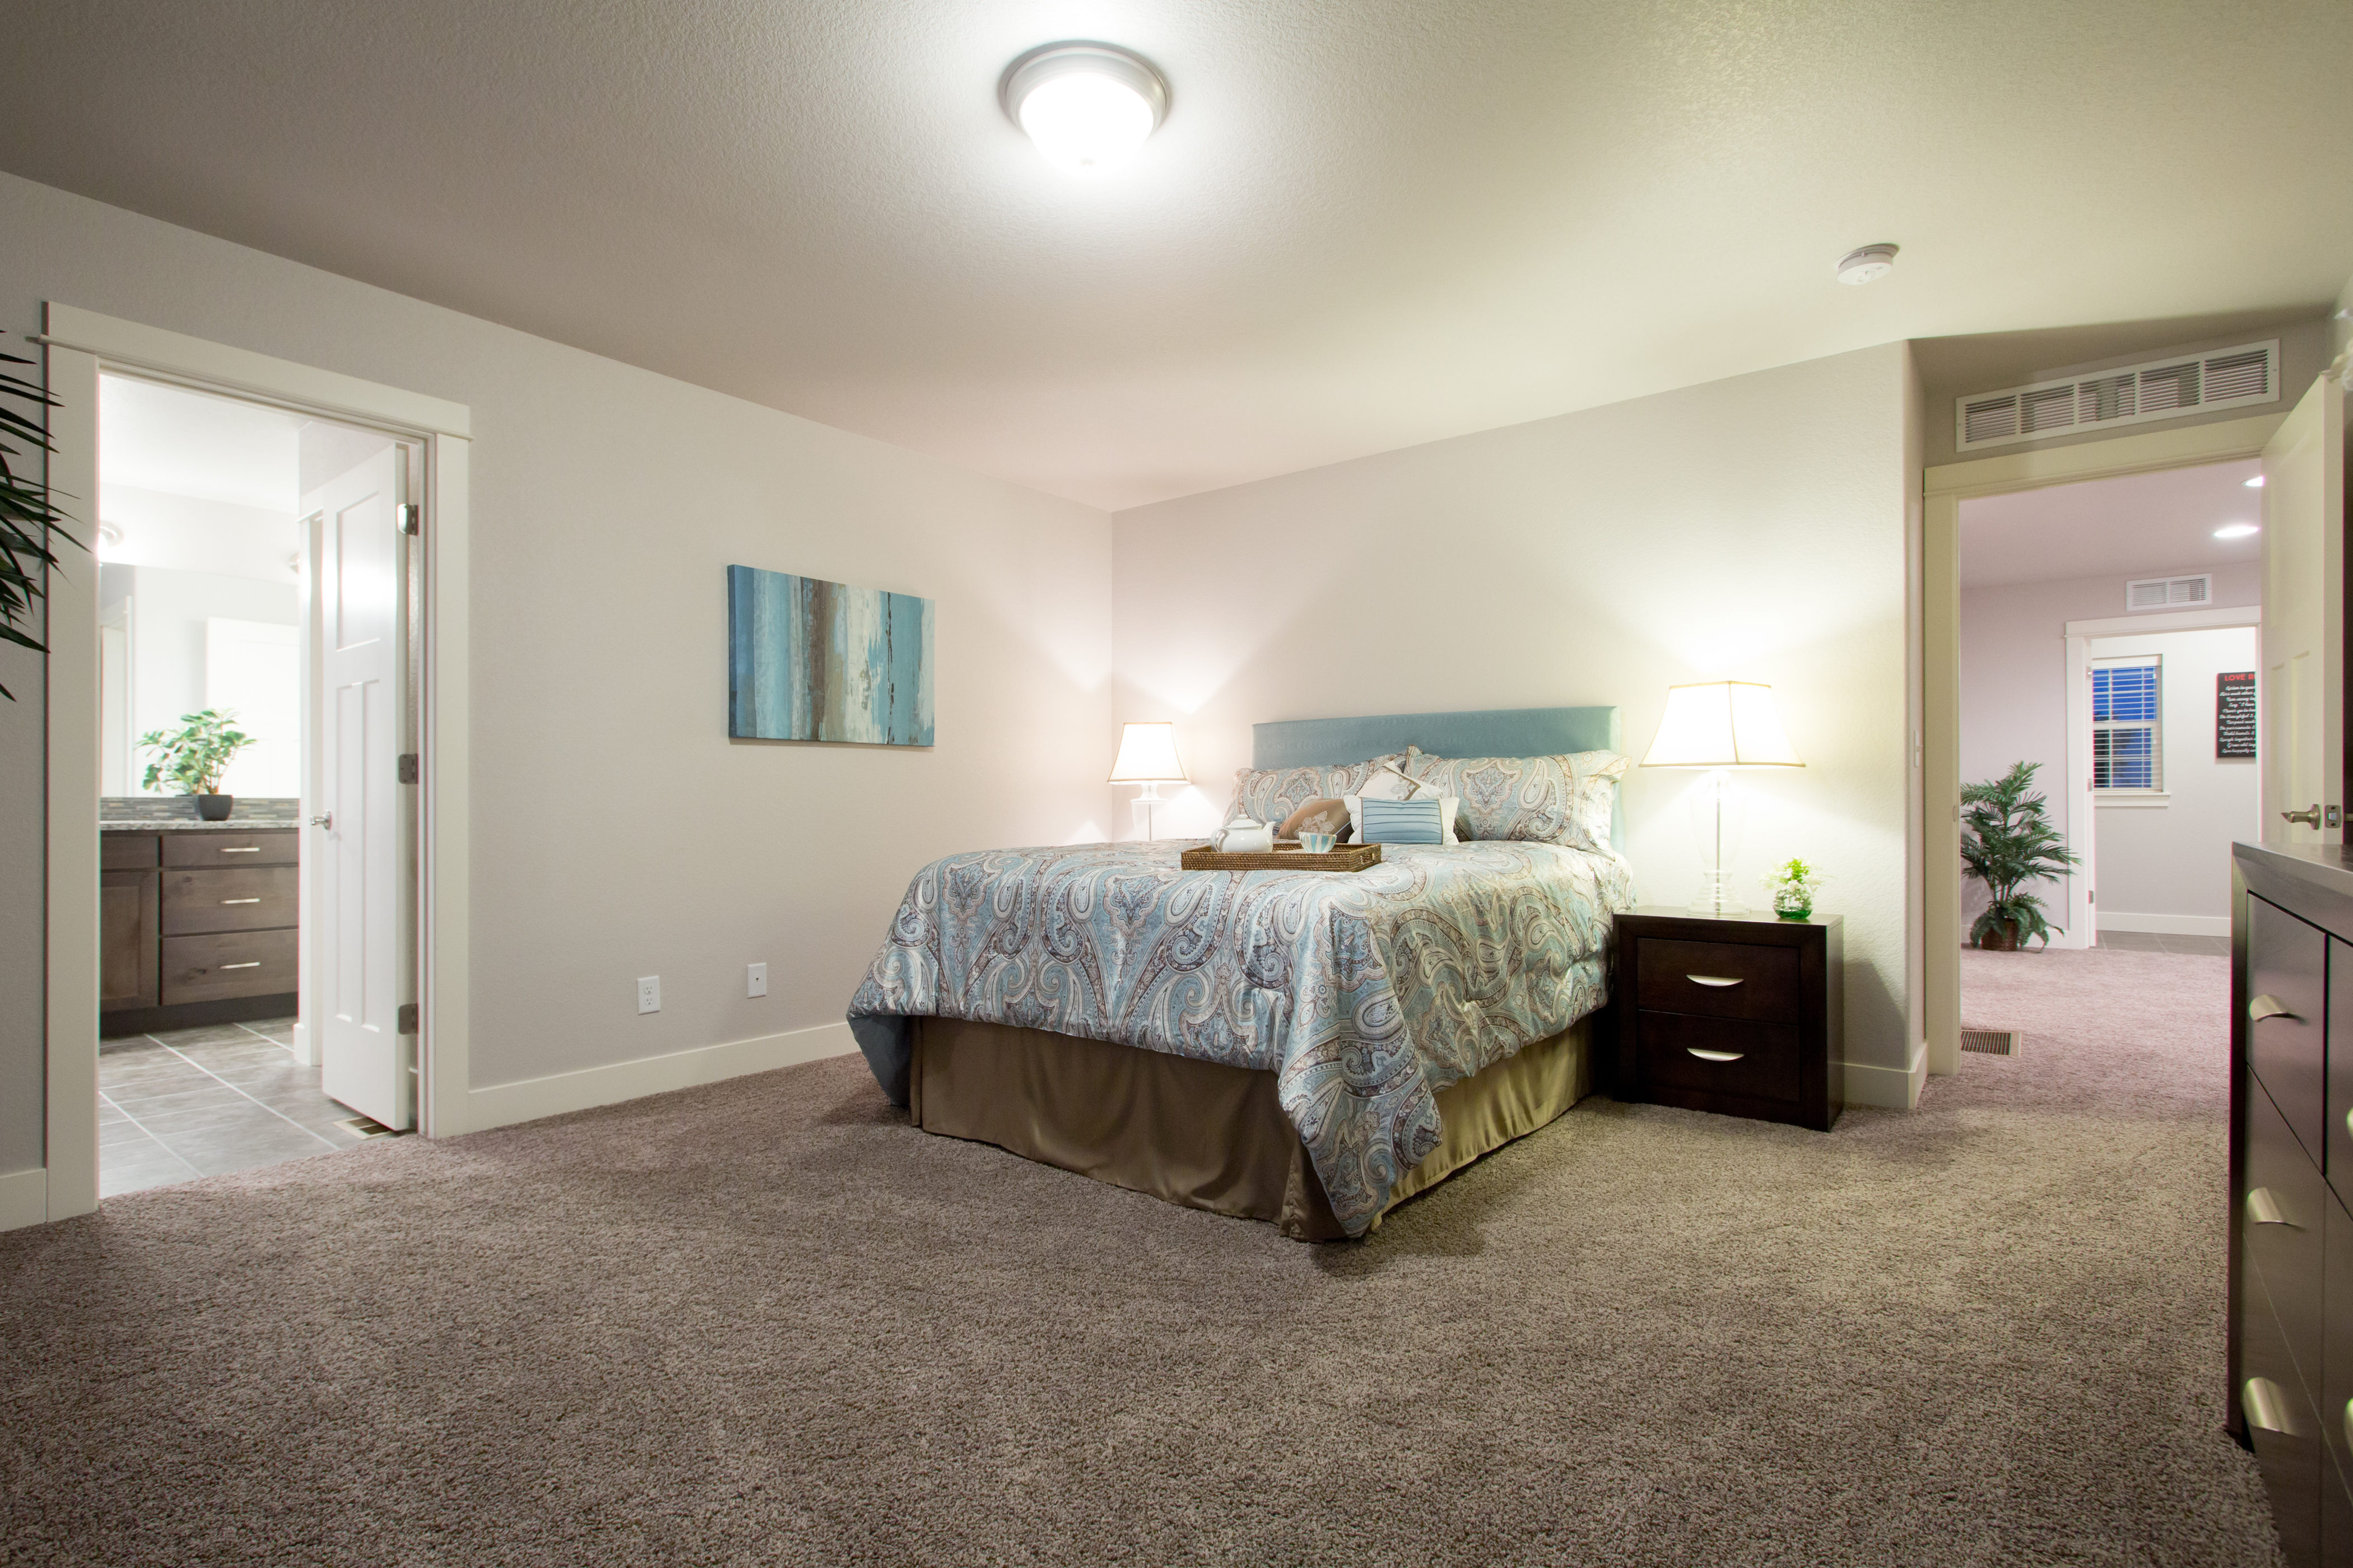 17-montrose-fort_collins-master_bedroom-new_house